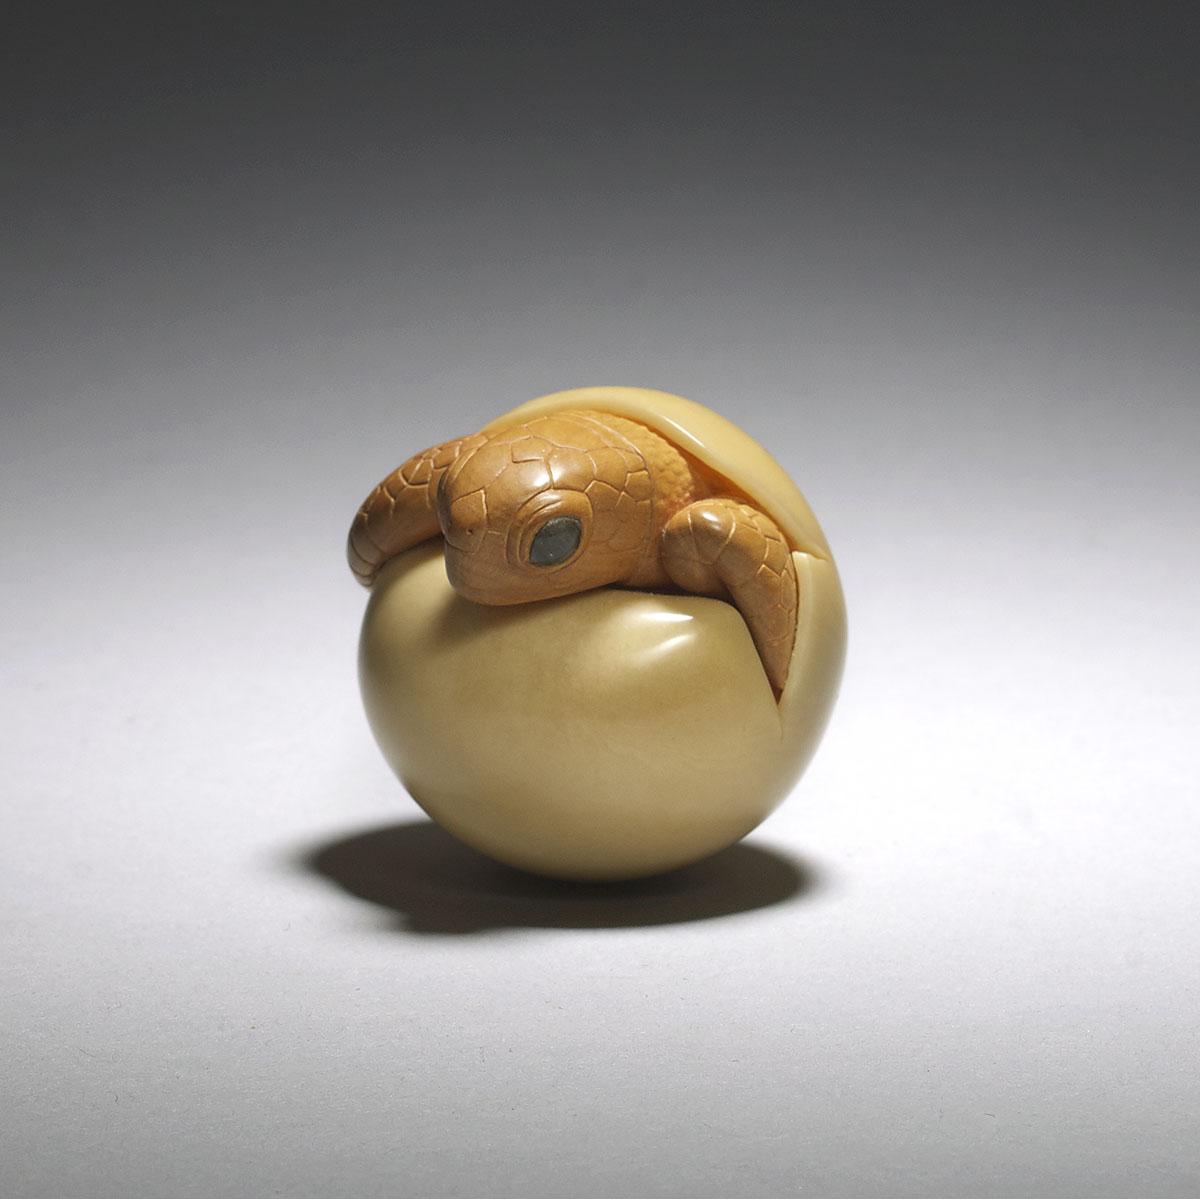 Susan Wraight, Boxwood and corozo nut netsuke of a hatching turtle